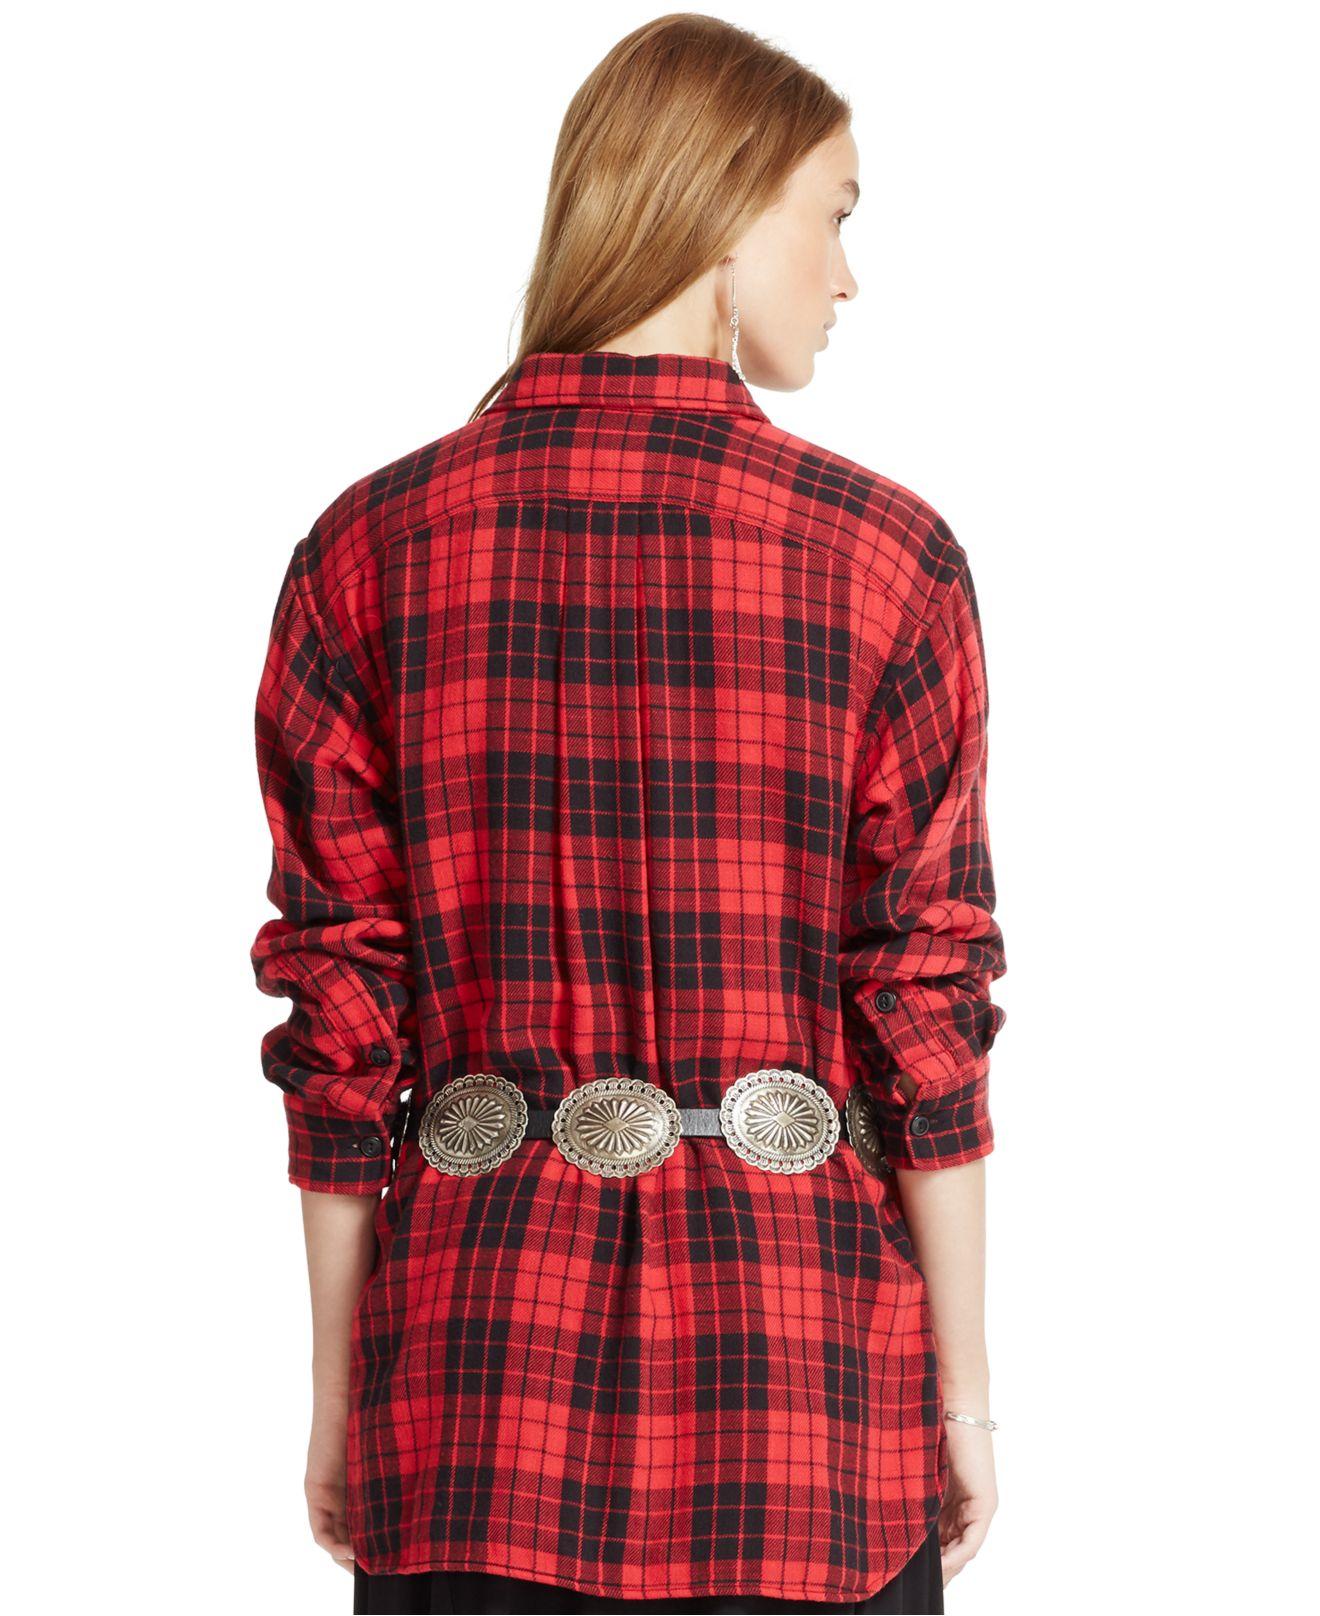 lyst polo ralph lauren plaid cotton boyfriend shirt in red. Black Bedroom Furniture Sets. Home Design Ideas